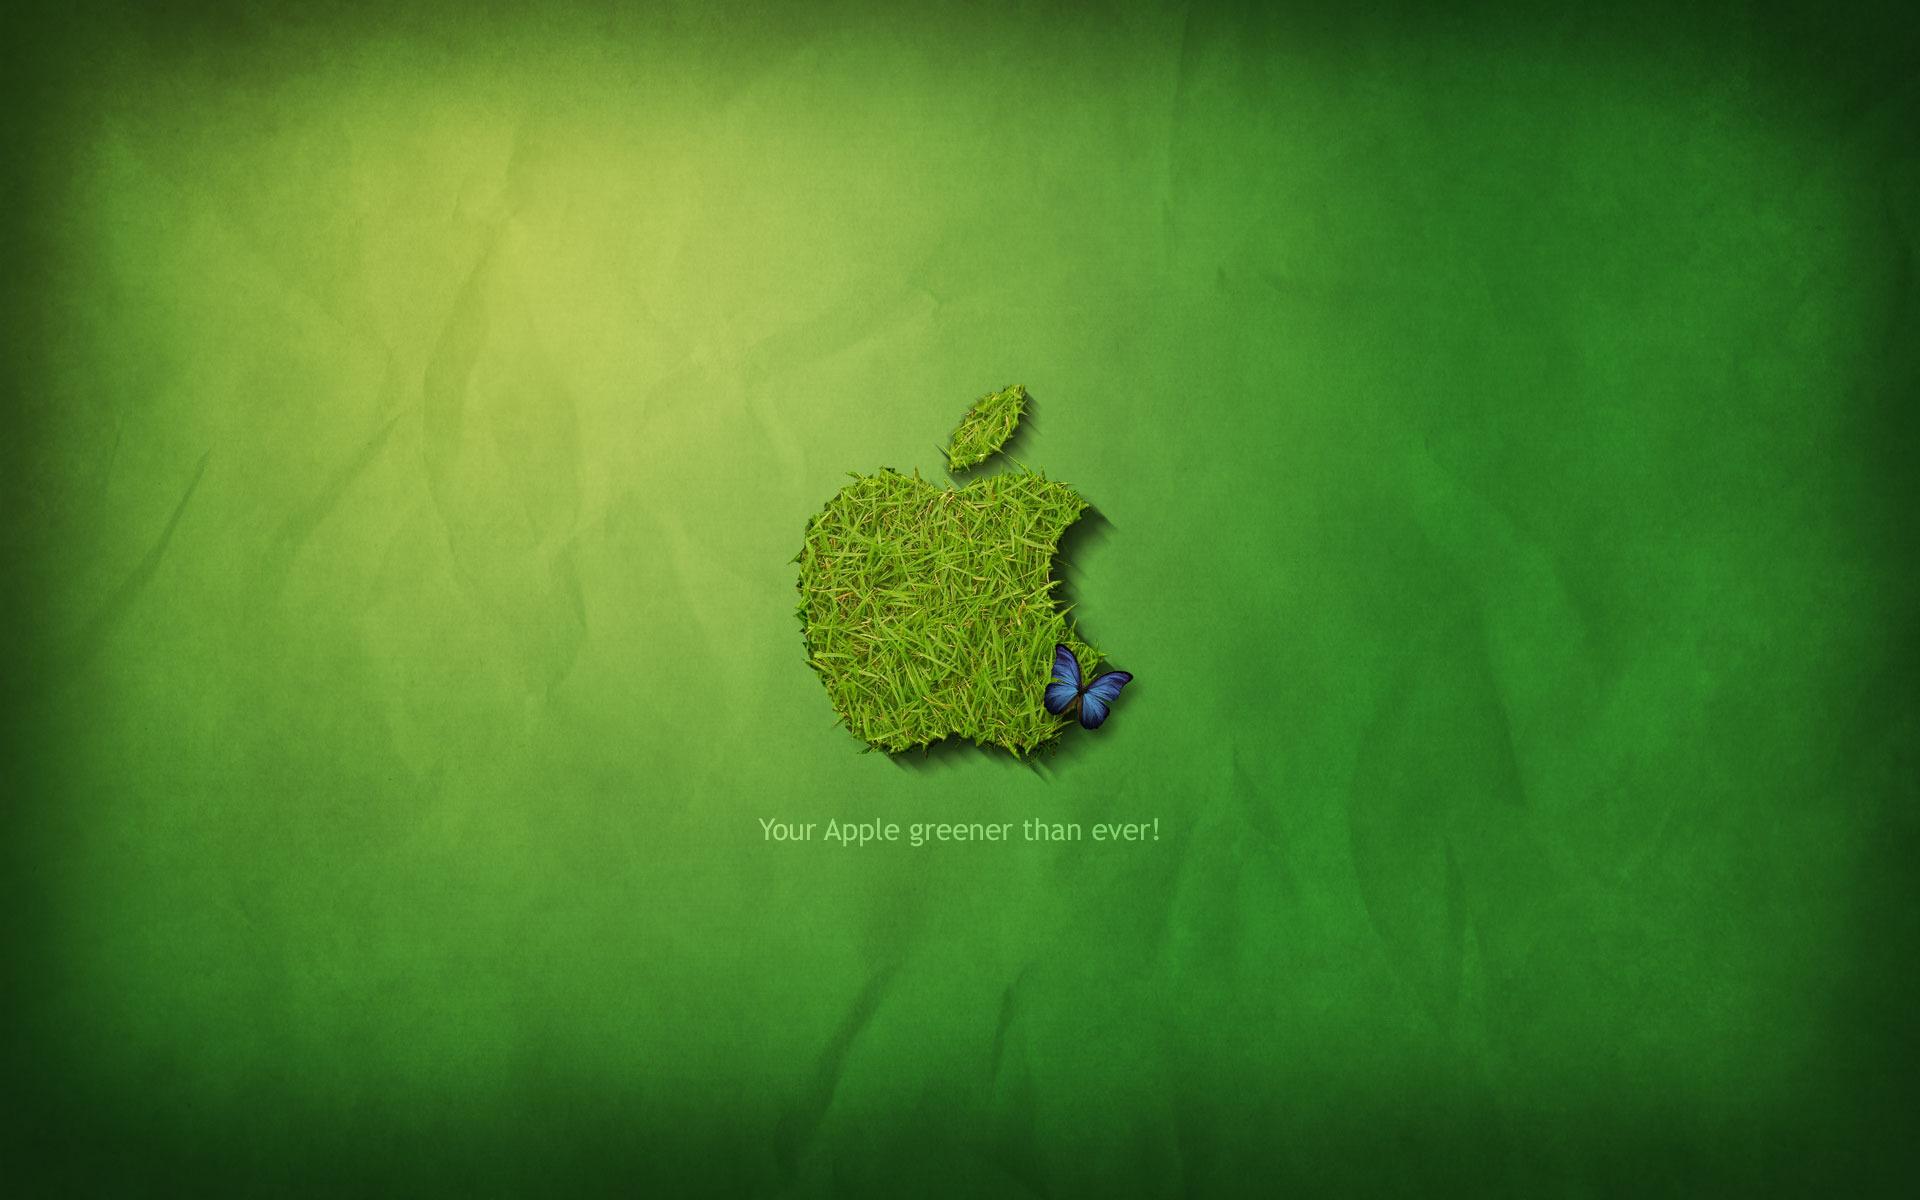 Grass Apple Logo Background 18852 1920x1200 px